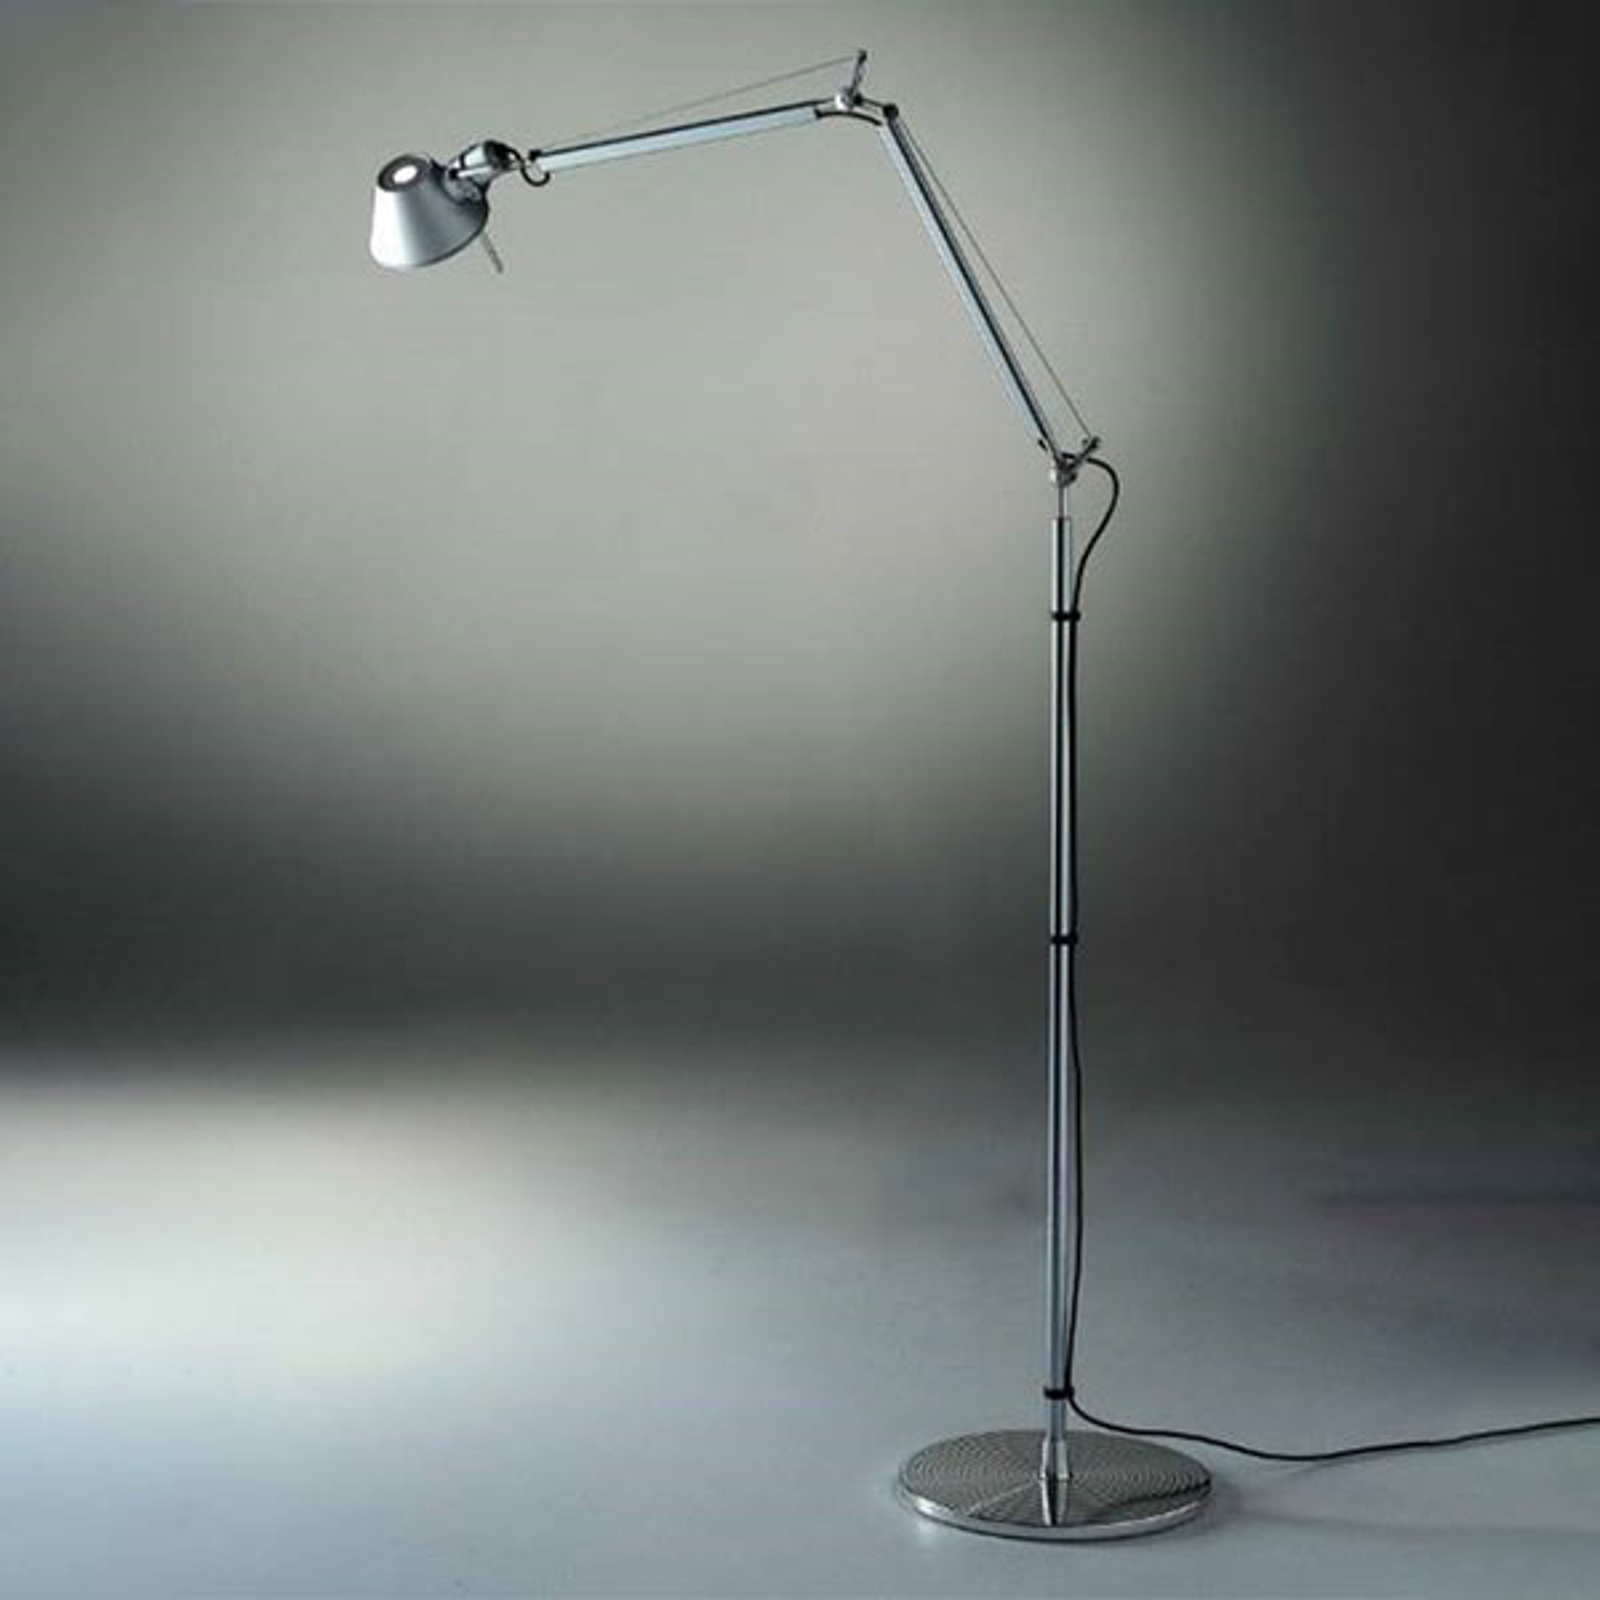 Artemide Tolomeo lampadaire LED Tunable White